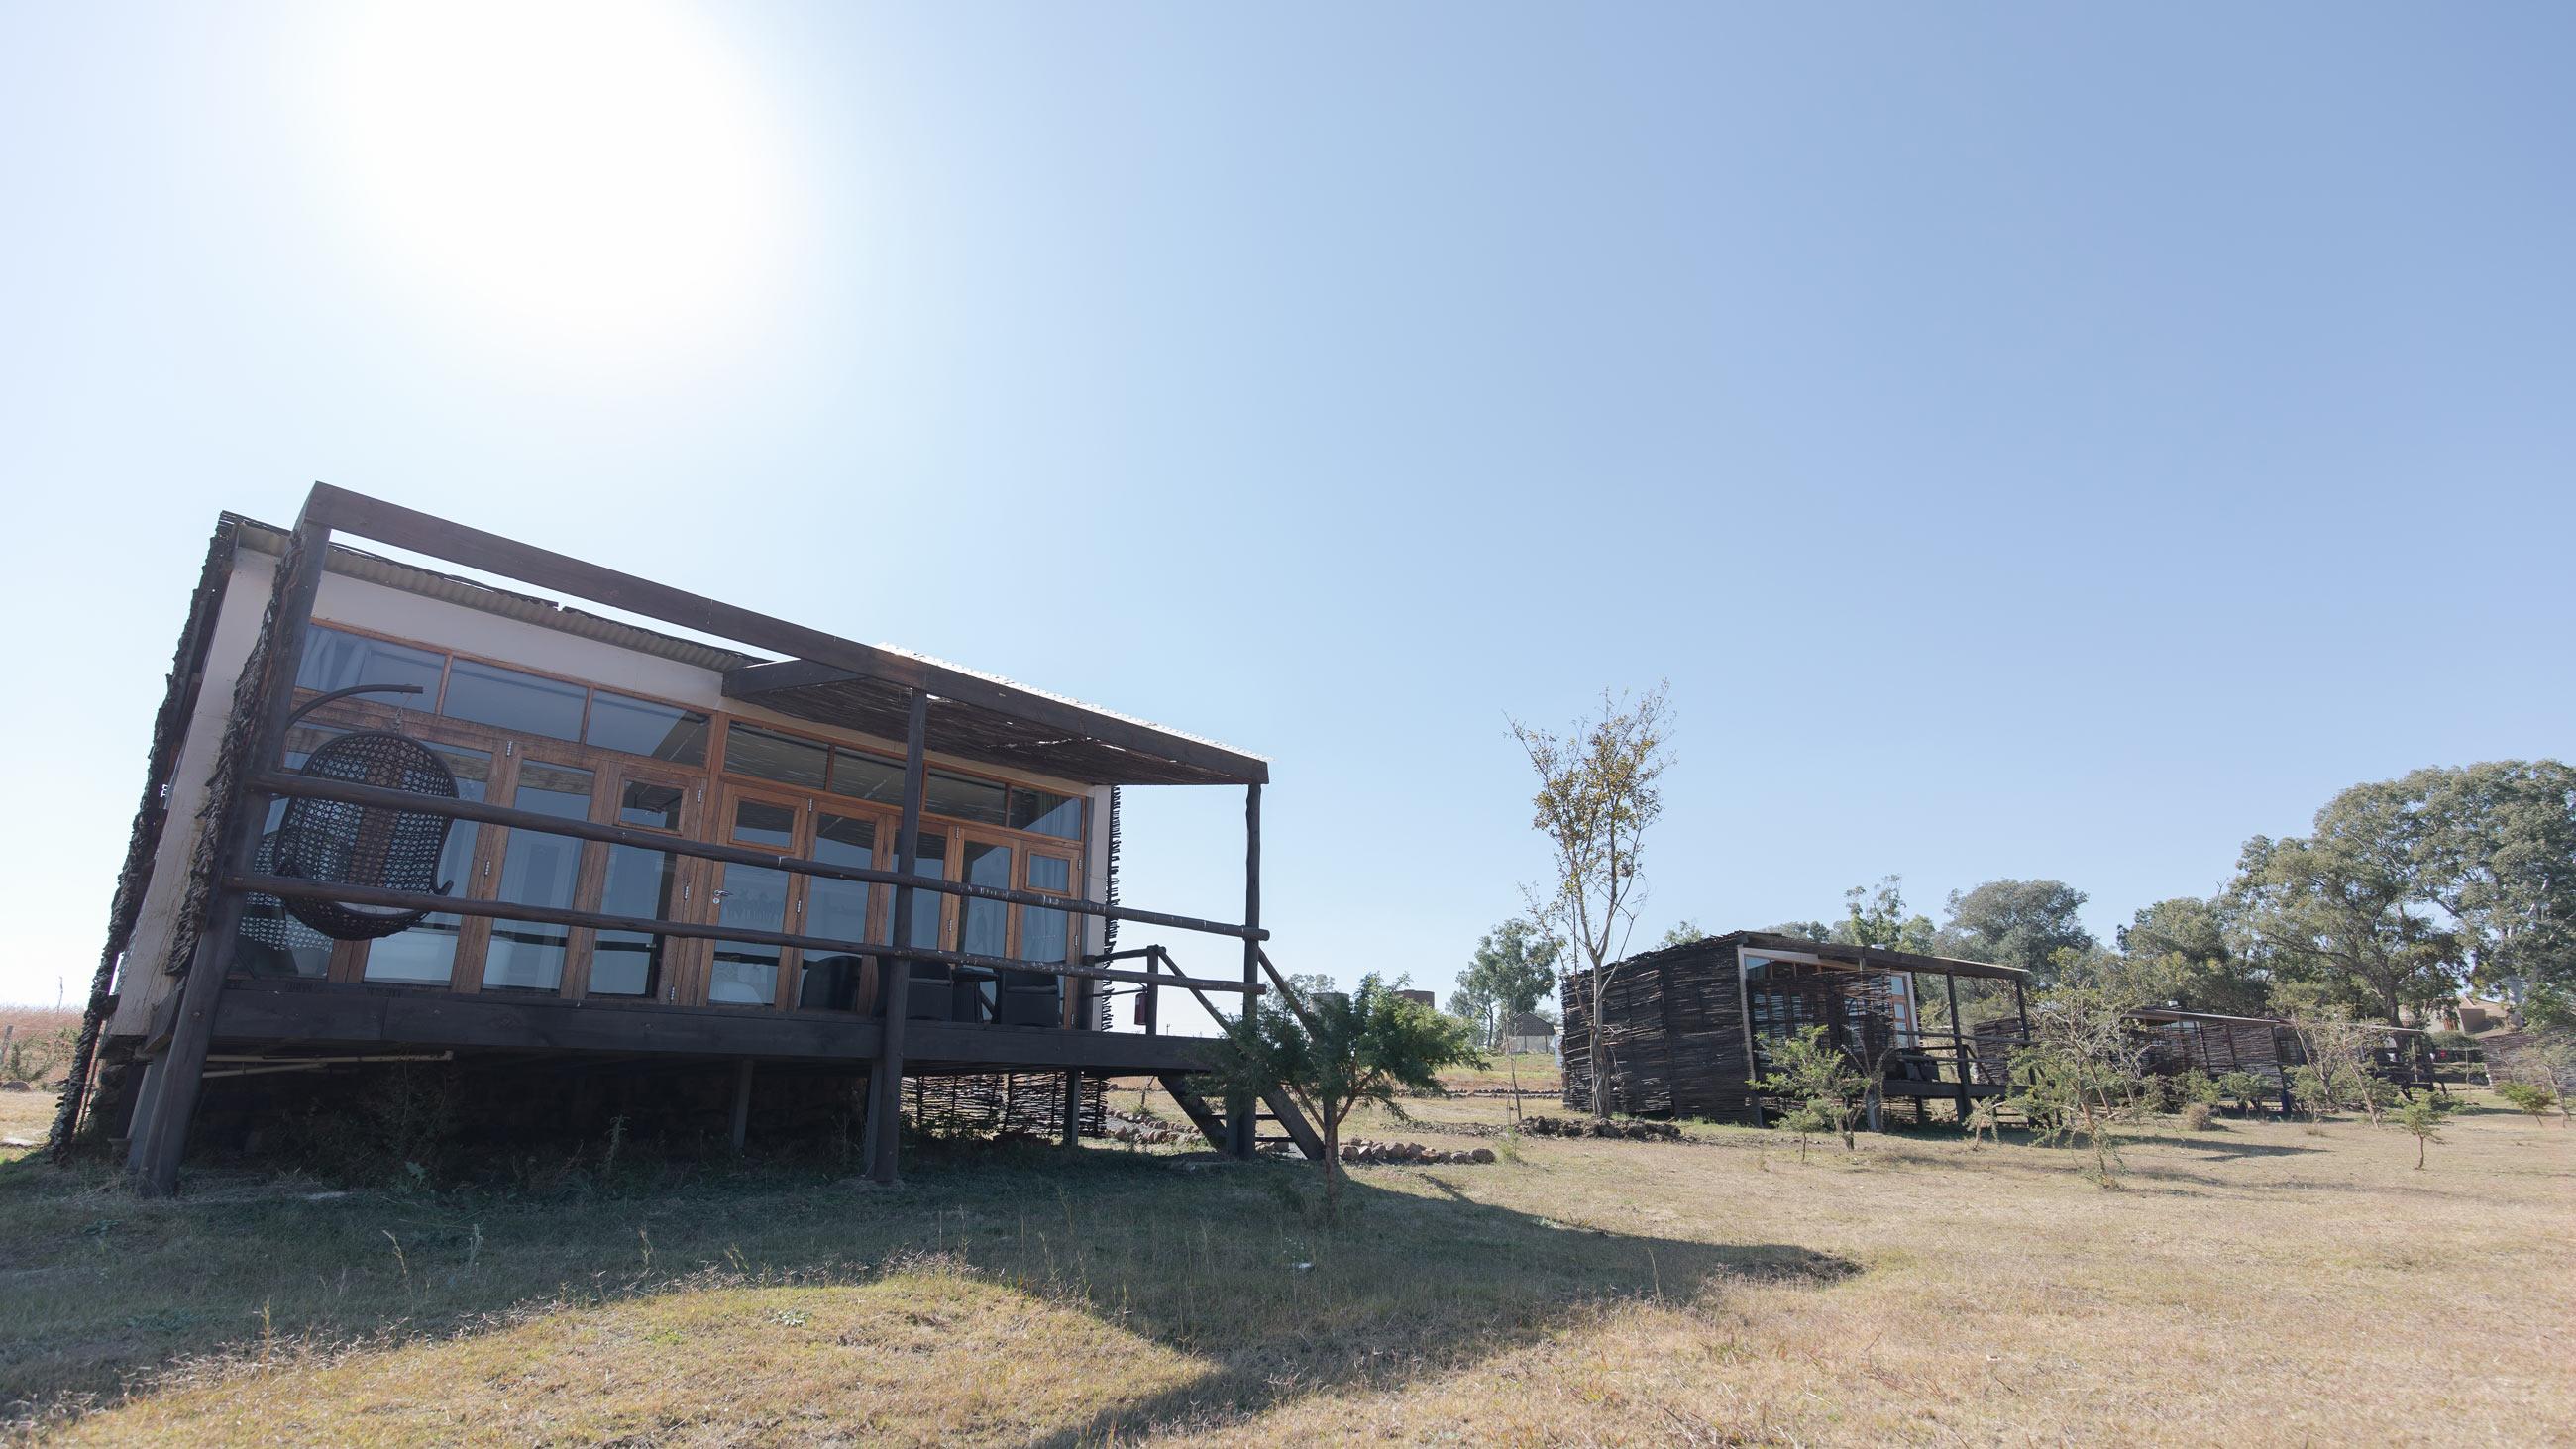 cheetah-ridge-nambiti-game-reserve-south-africa-accommodation